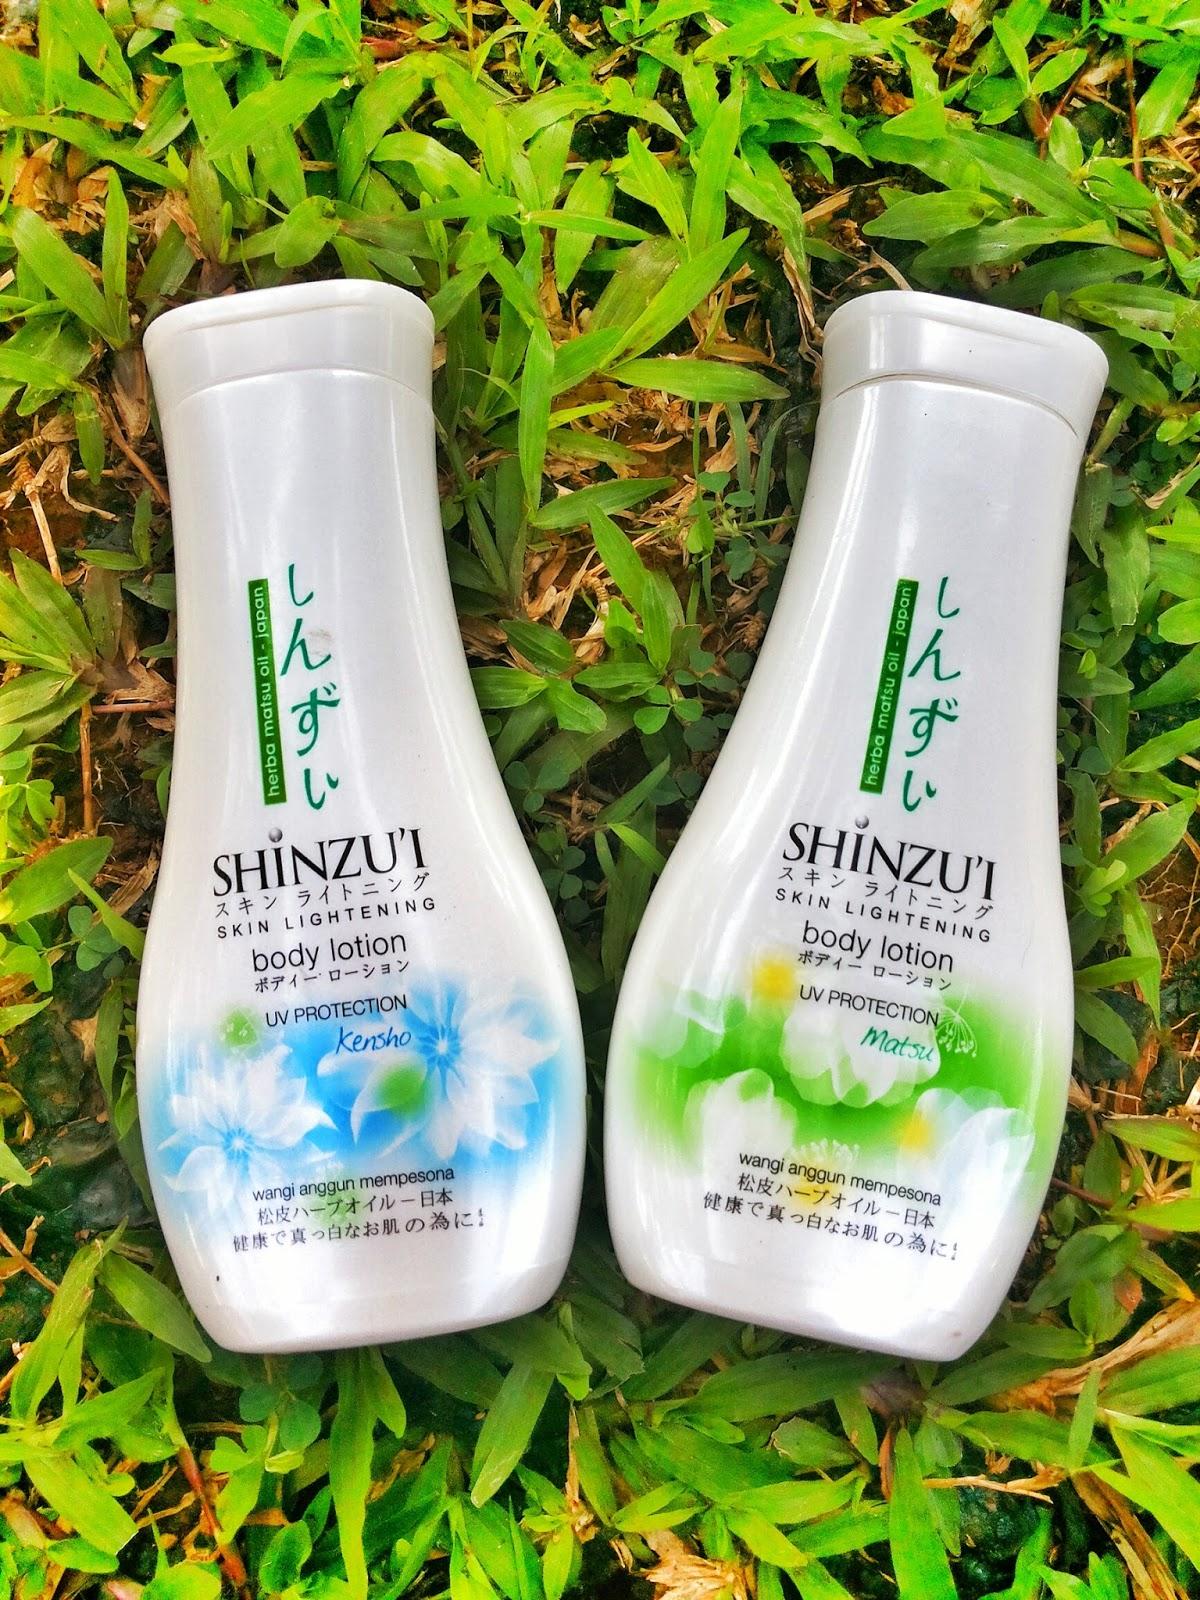 Cerita Cha Shinzui Mempesona Kulit Dengan Herba Matsu Oil Kriteria Saya Dalam Memilih Body Lotion Wanita Untuk Sehari Hari Sebenarnya Gampang Yang Penting Mudah Didapatkan Tidak Lengket Wangi Dan Manfaatnya Buat